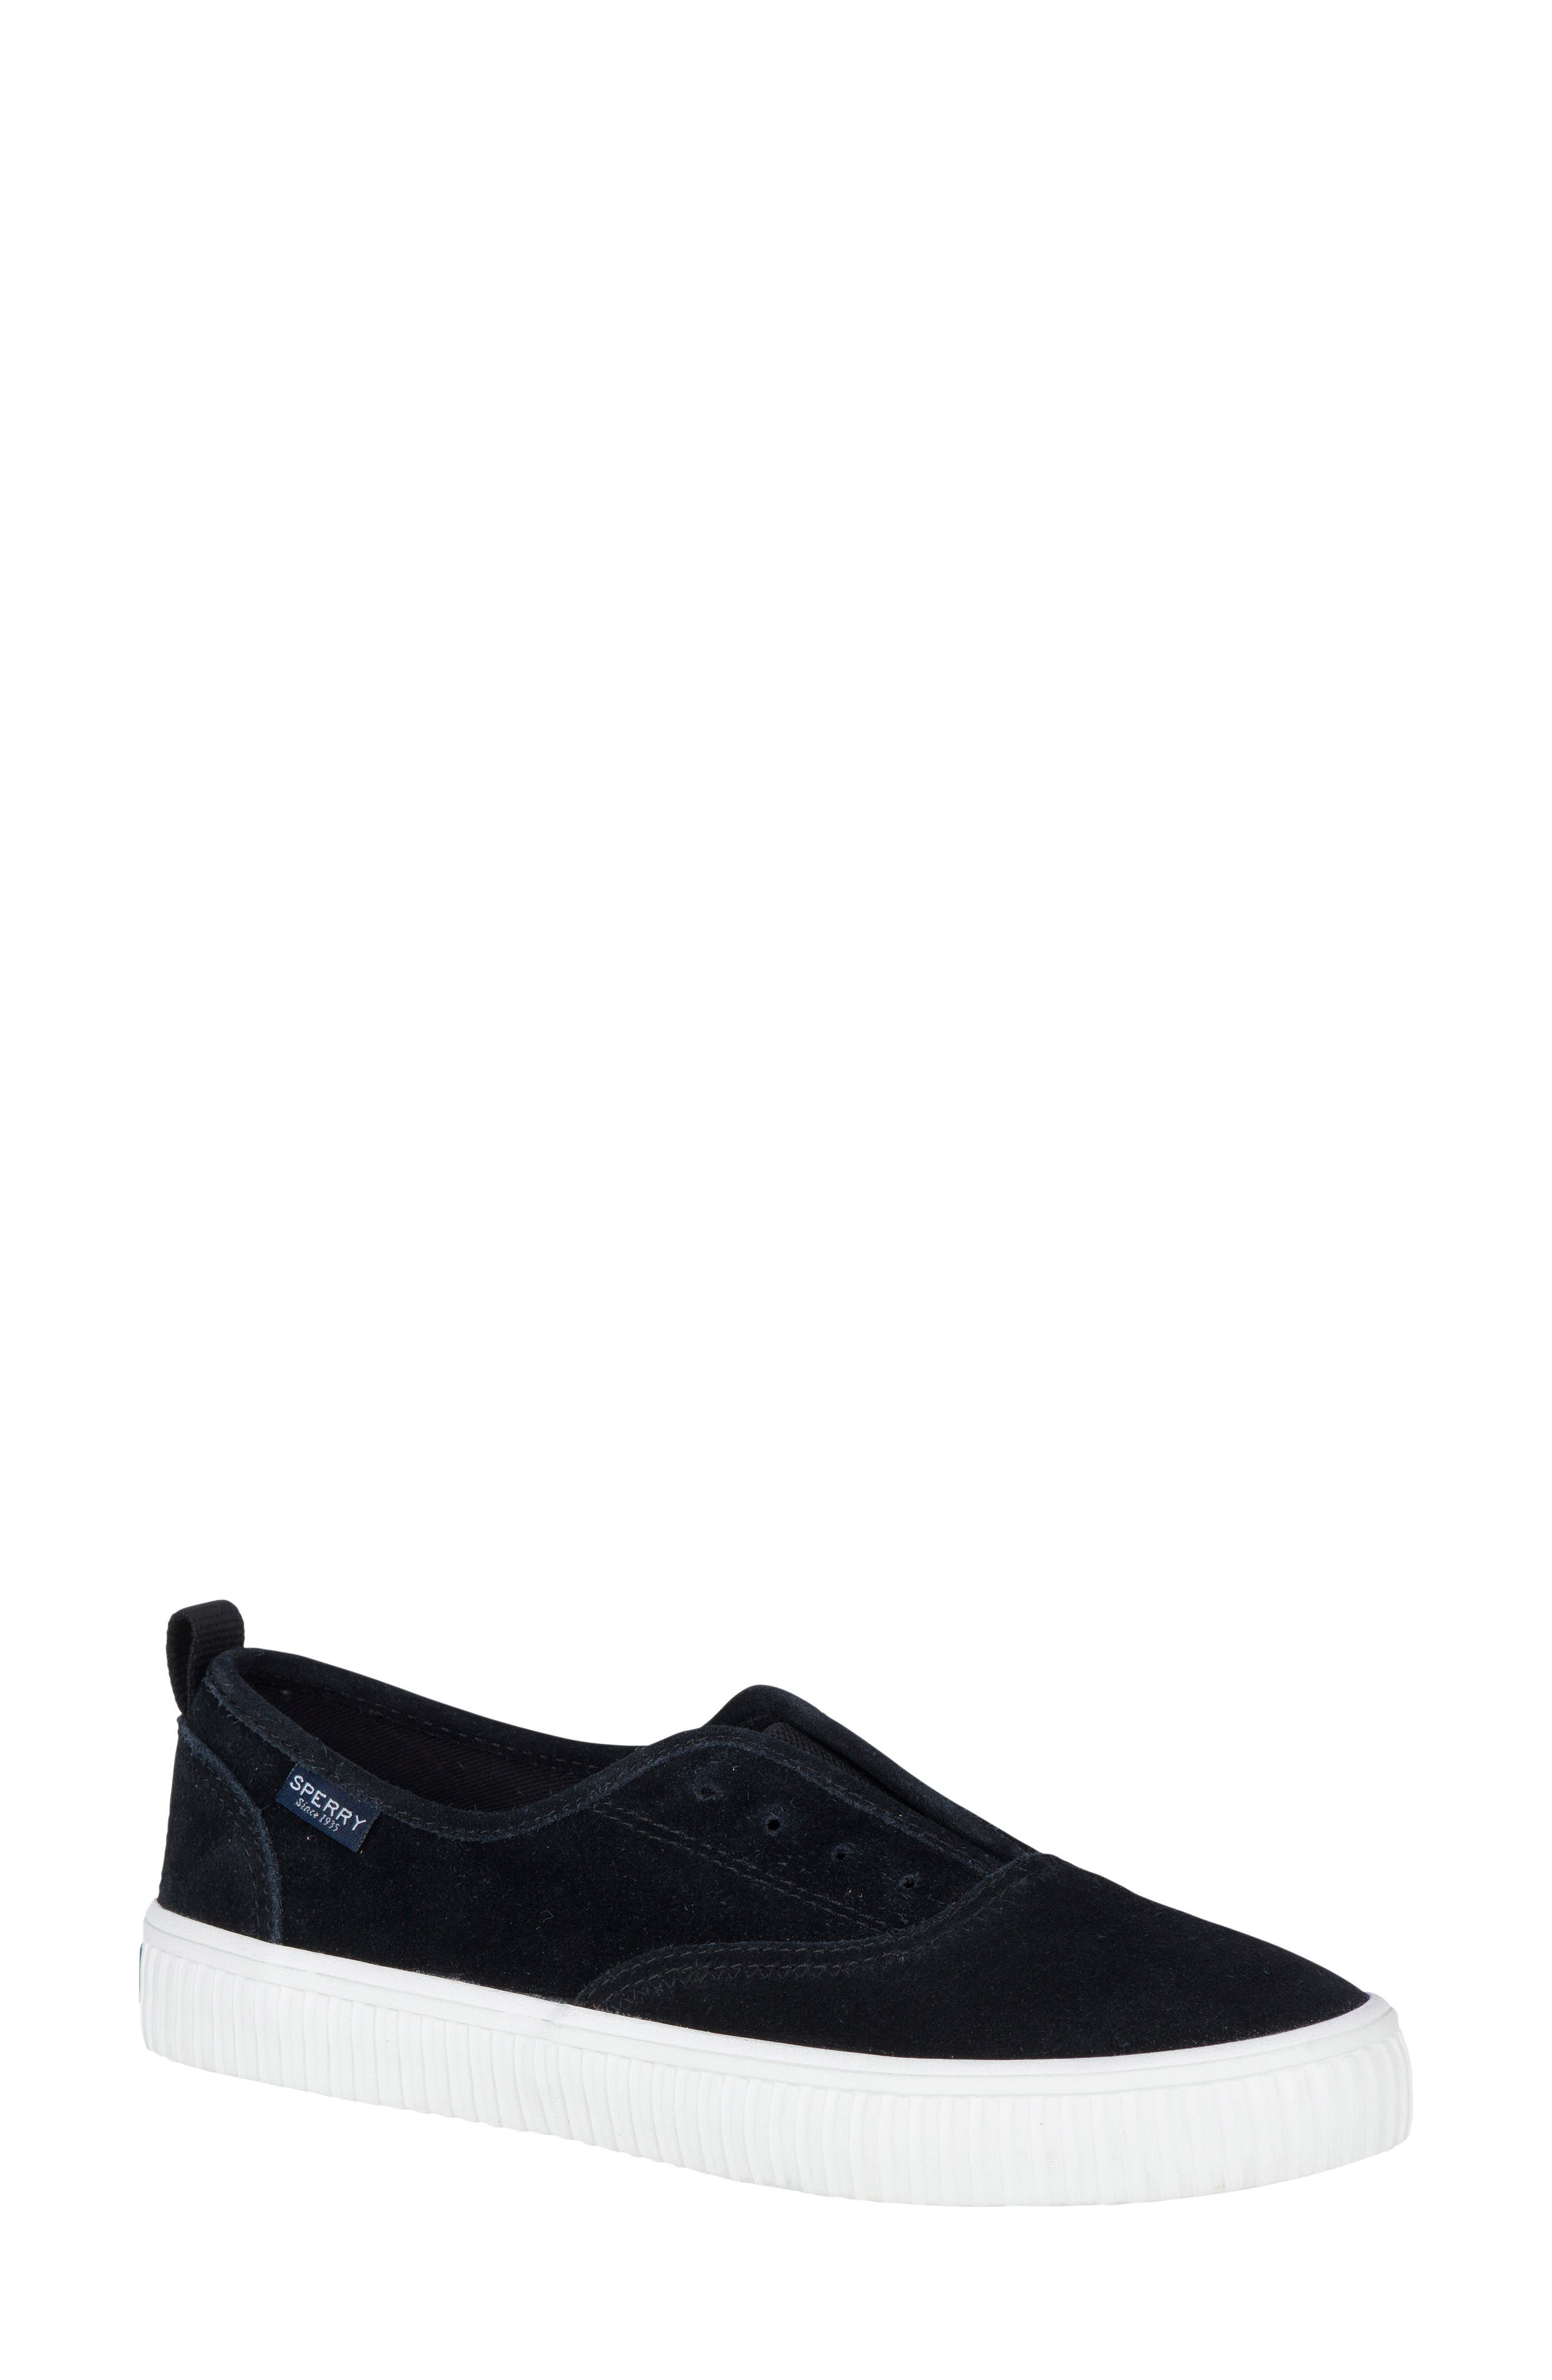 Crest Creeper Slip-On Sneaker,                         Main,                         color, 001